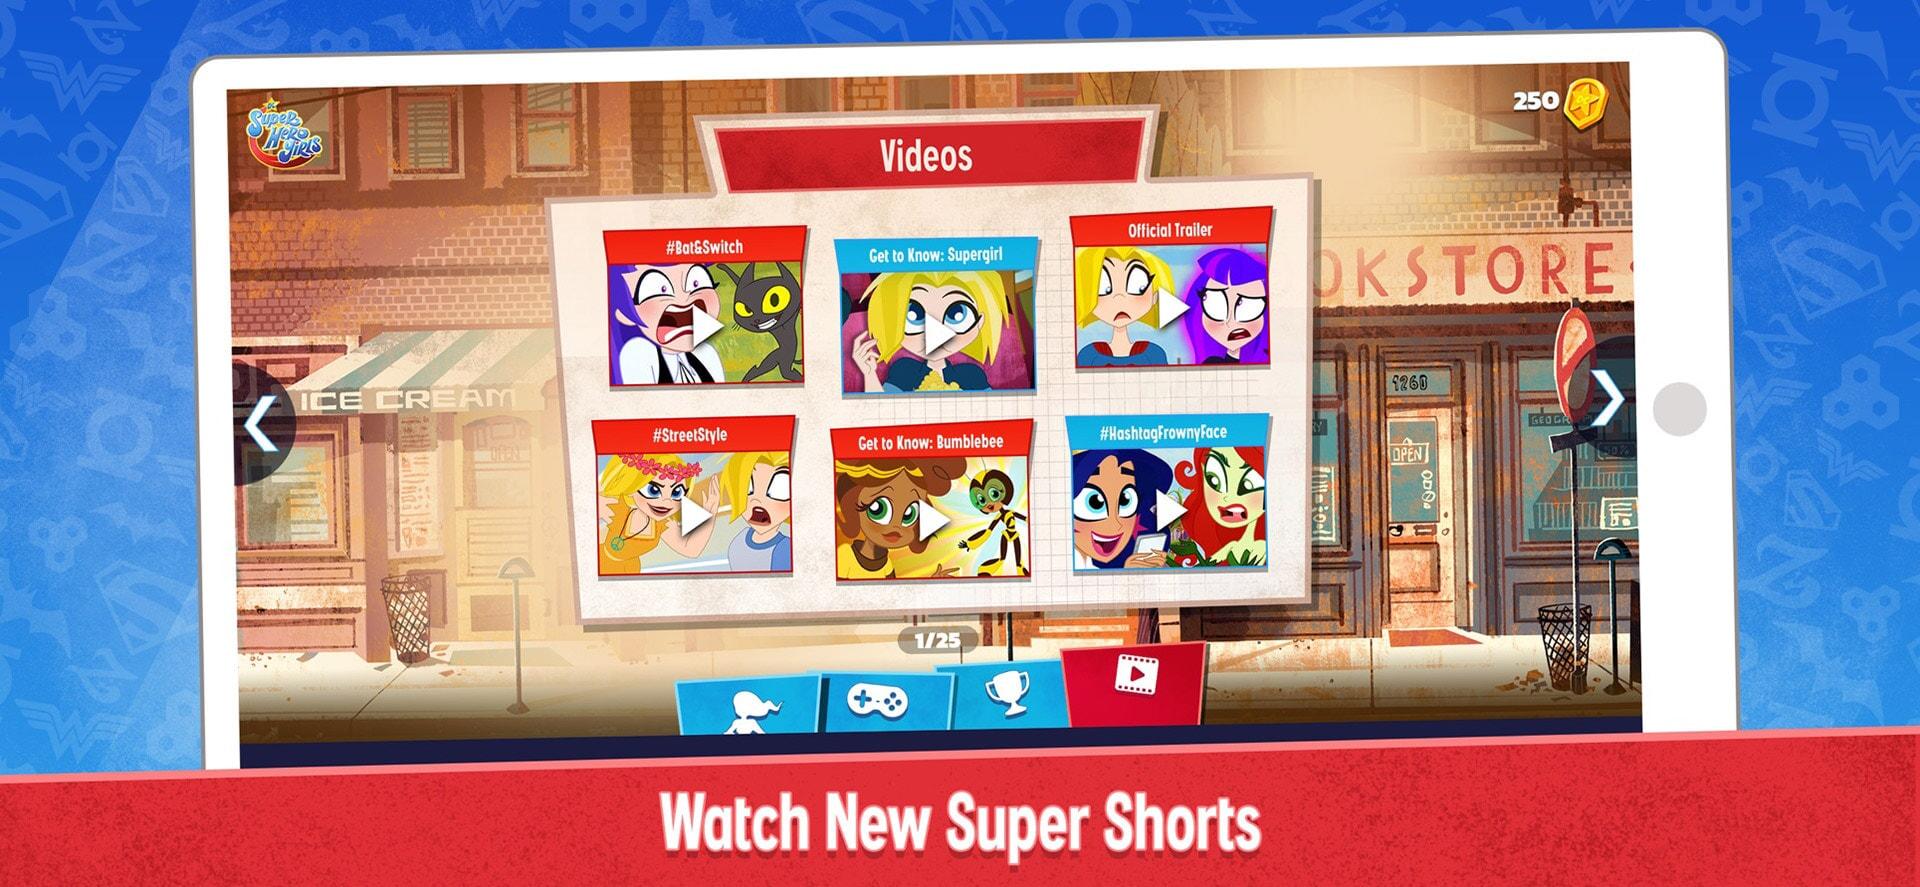 DC Super Hero Girls: Watch New Super Shorts